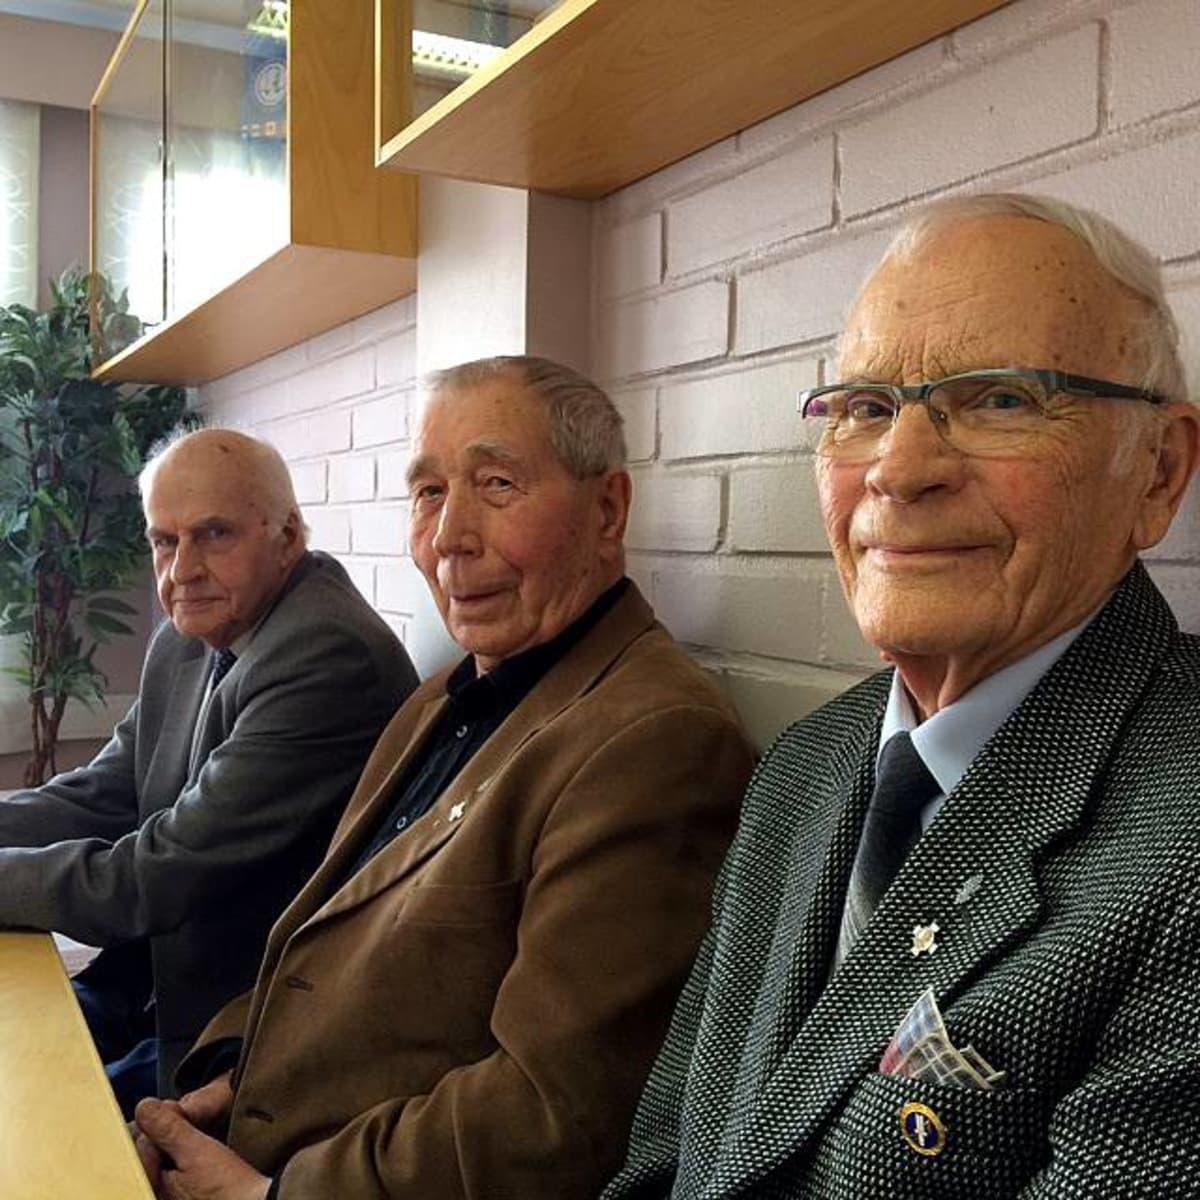 Kolme tamperelaista sotaveteraania